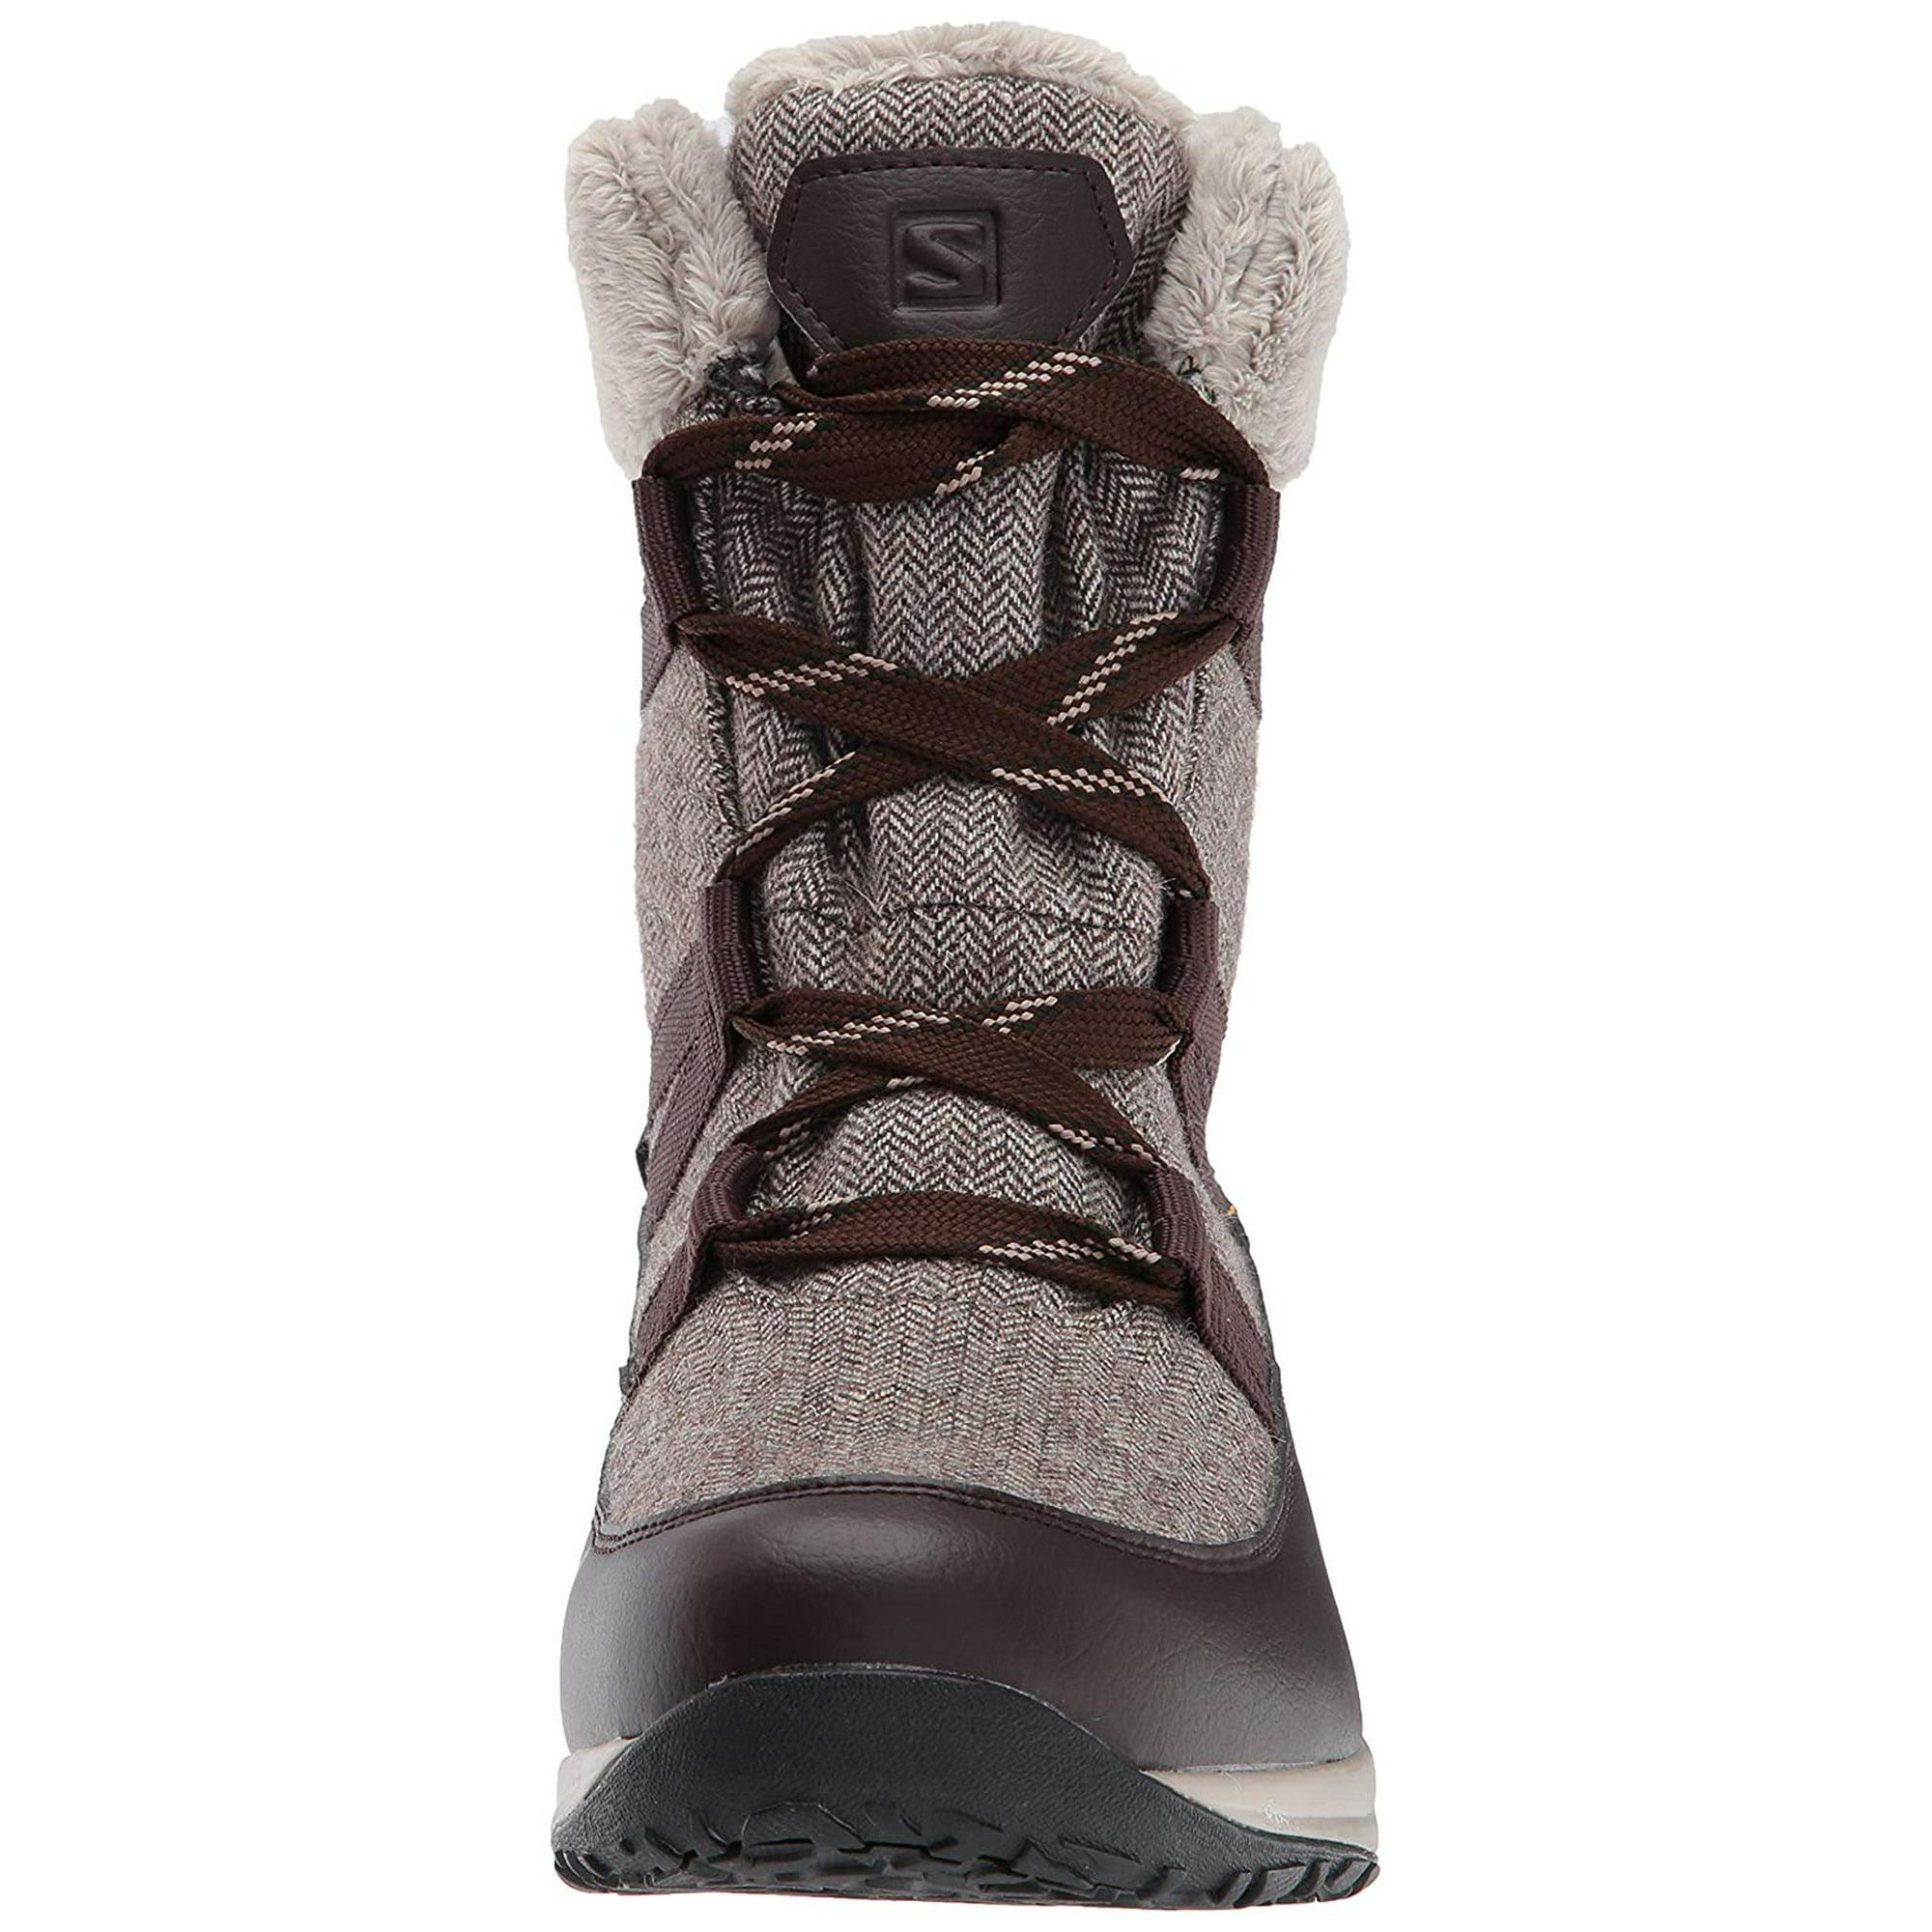 aef9e728655a Salomon Women s Heika LTR CS Waterproof Snow Boot